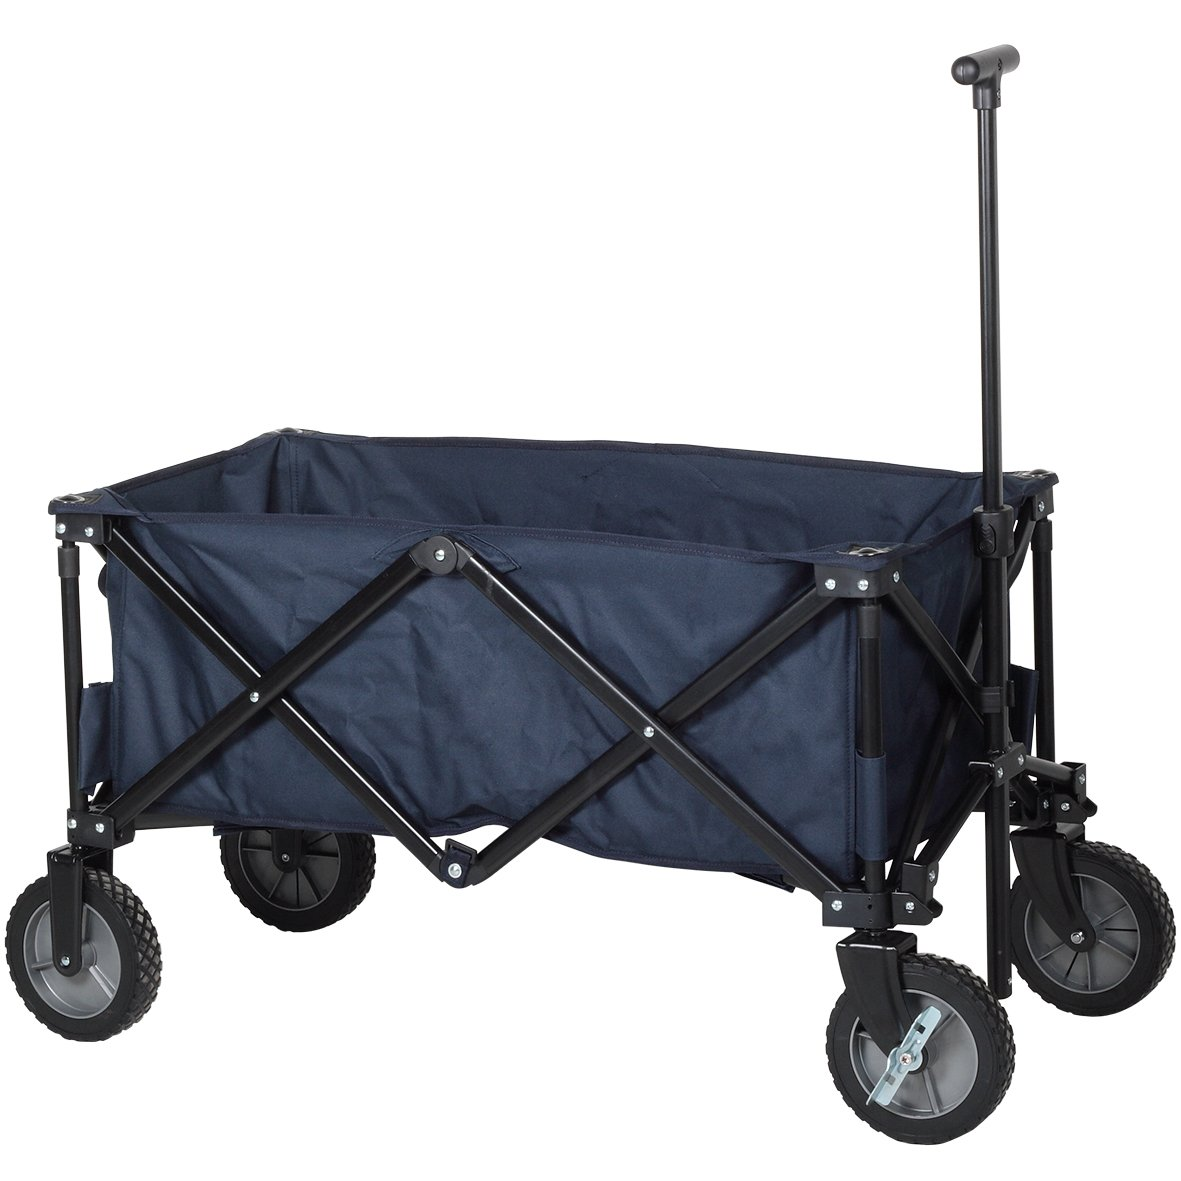 Capacidad 70 kg Carrito de jard/ín plegable Campart Travel HC-0910 Azul